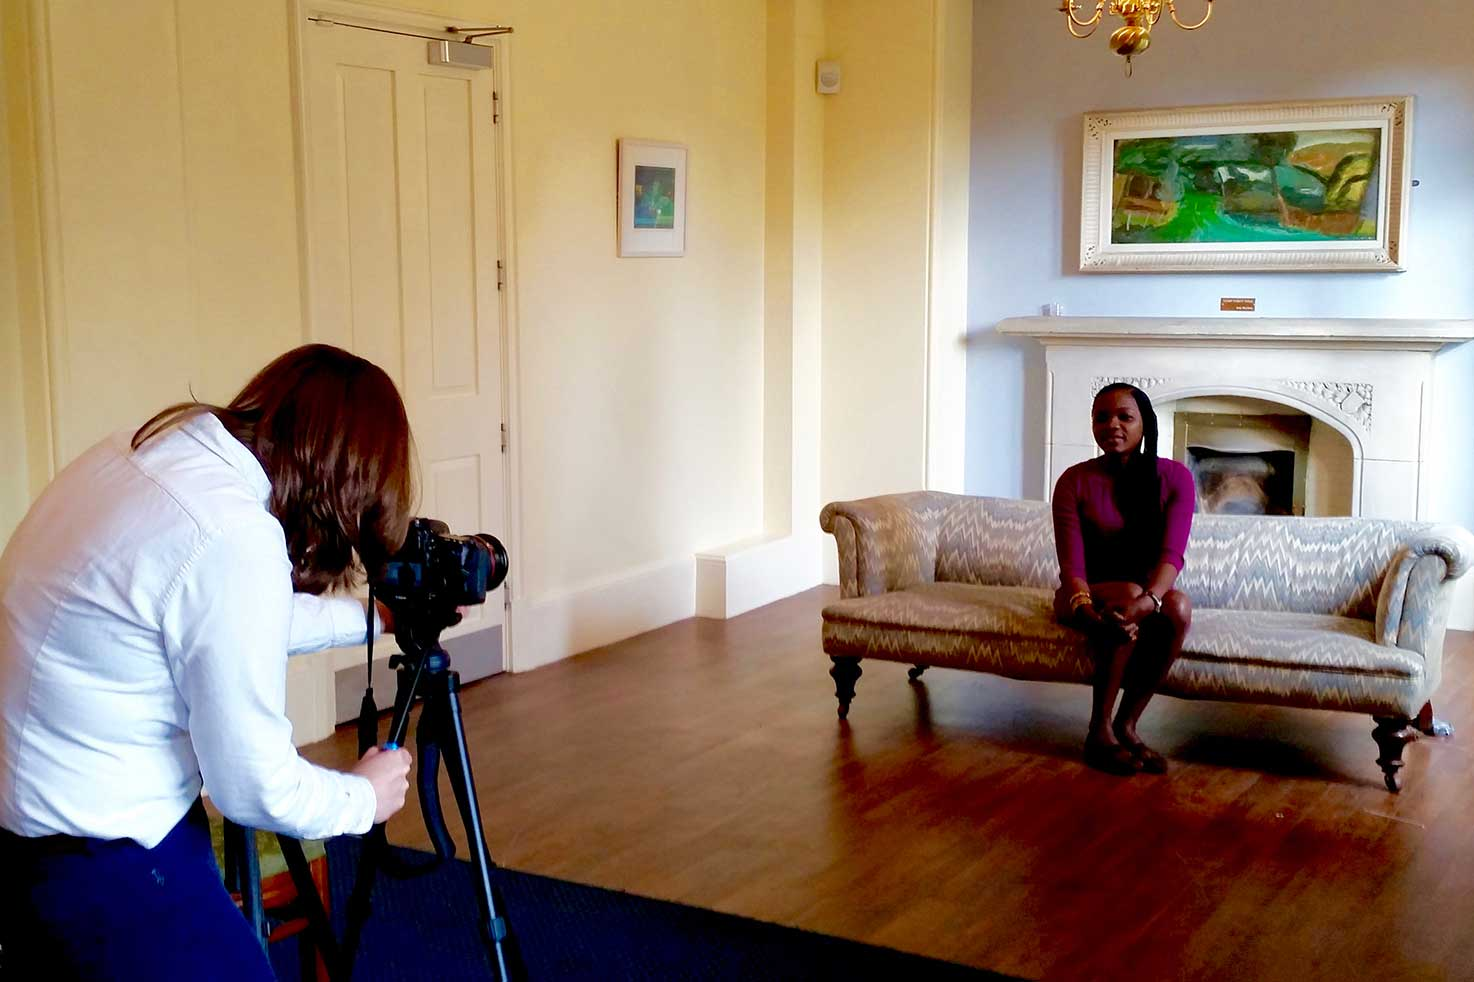 Nasikiwa Duke being interviewed in the UK